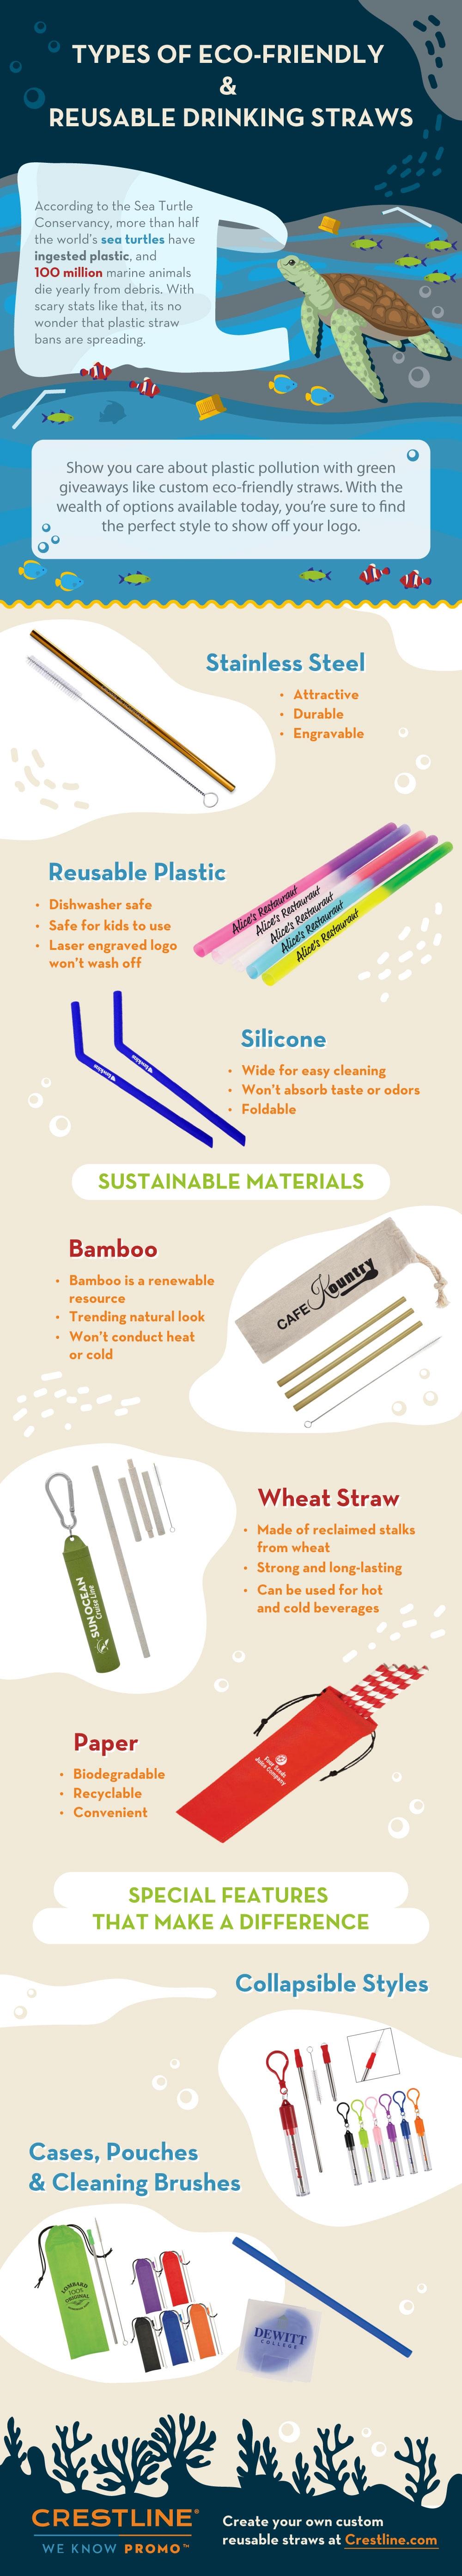 Reusable Straws Infographic